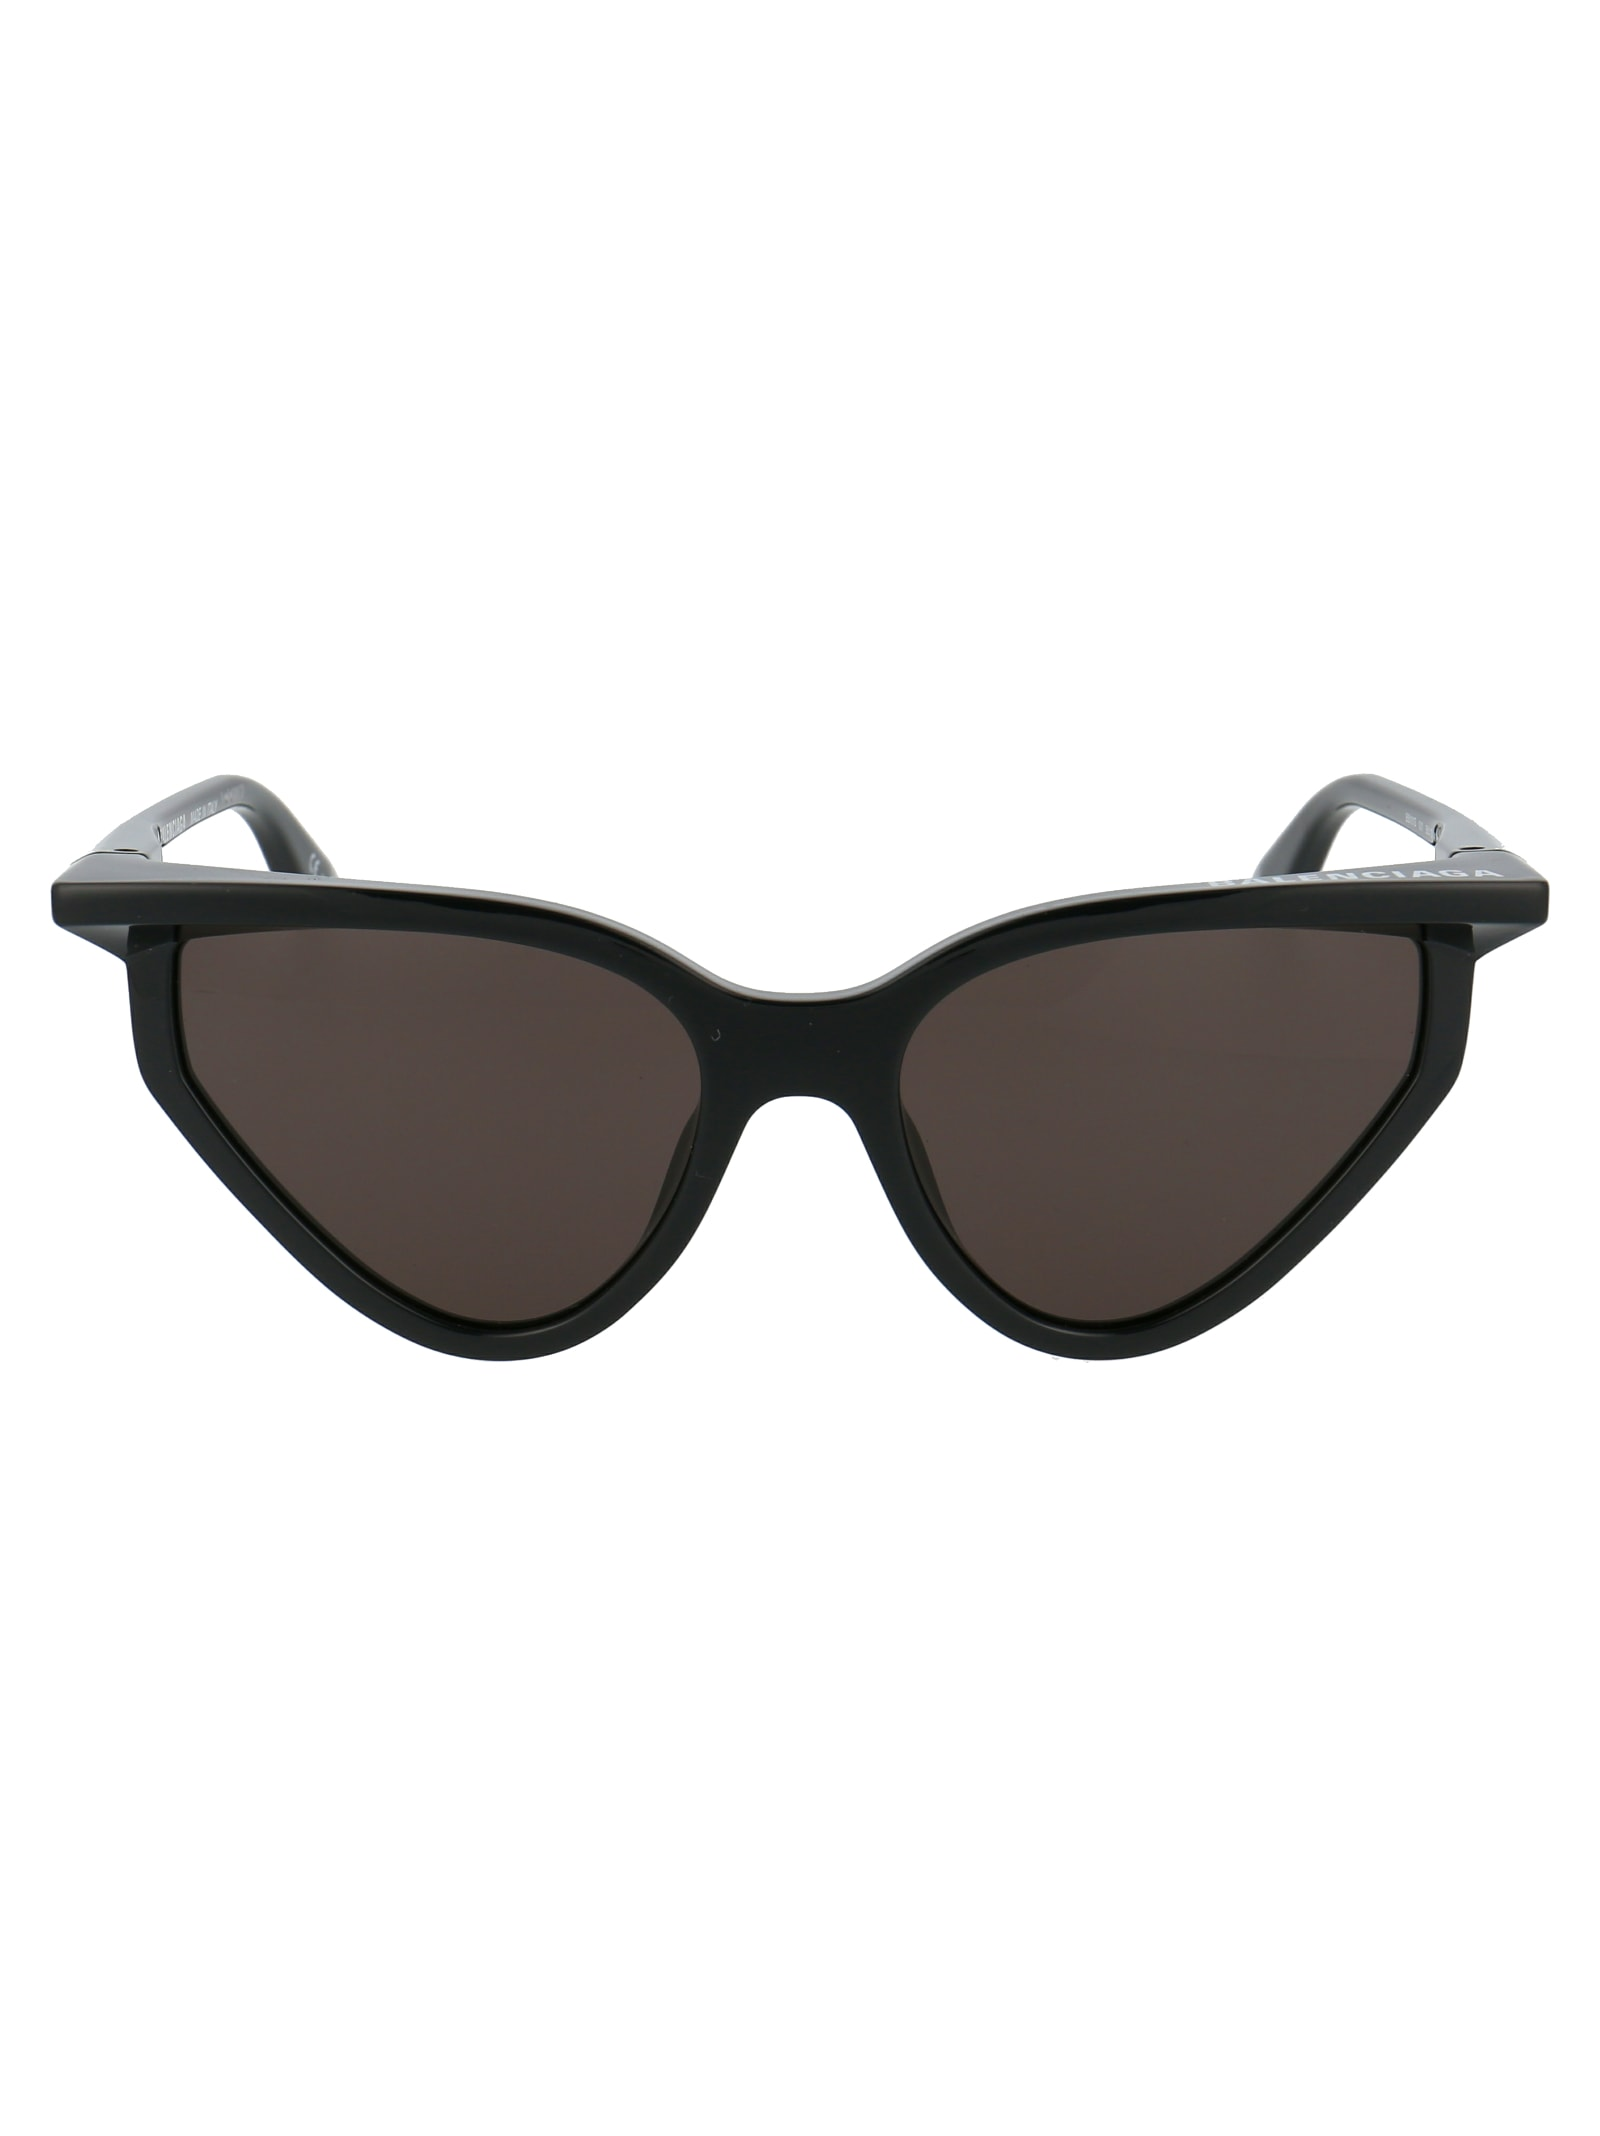 Balenciaga Bb0101s Sunglasses